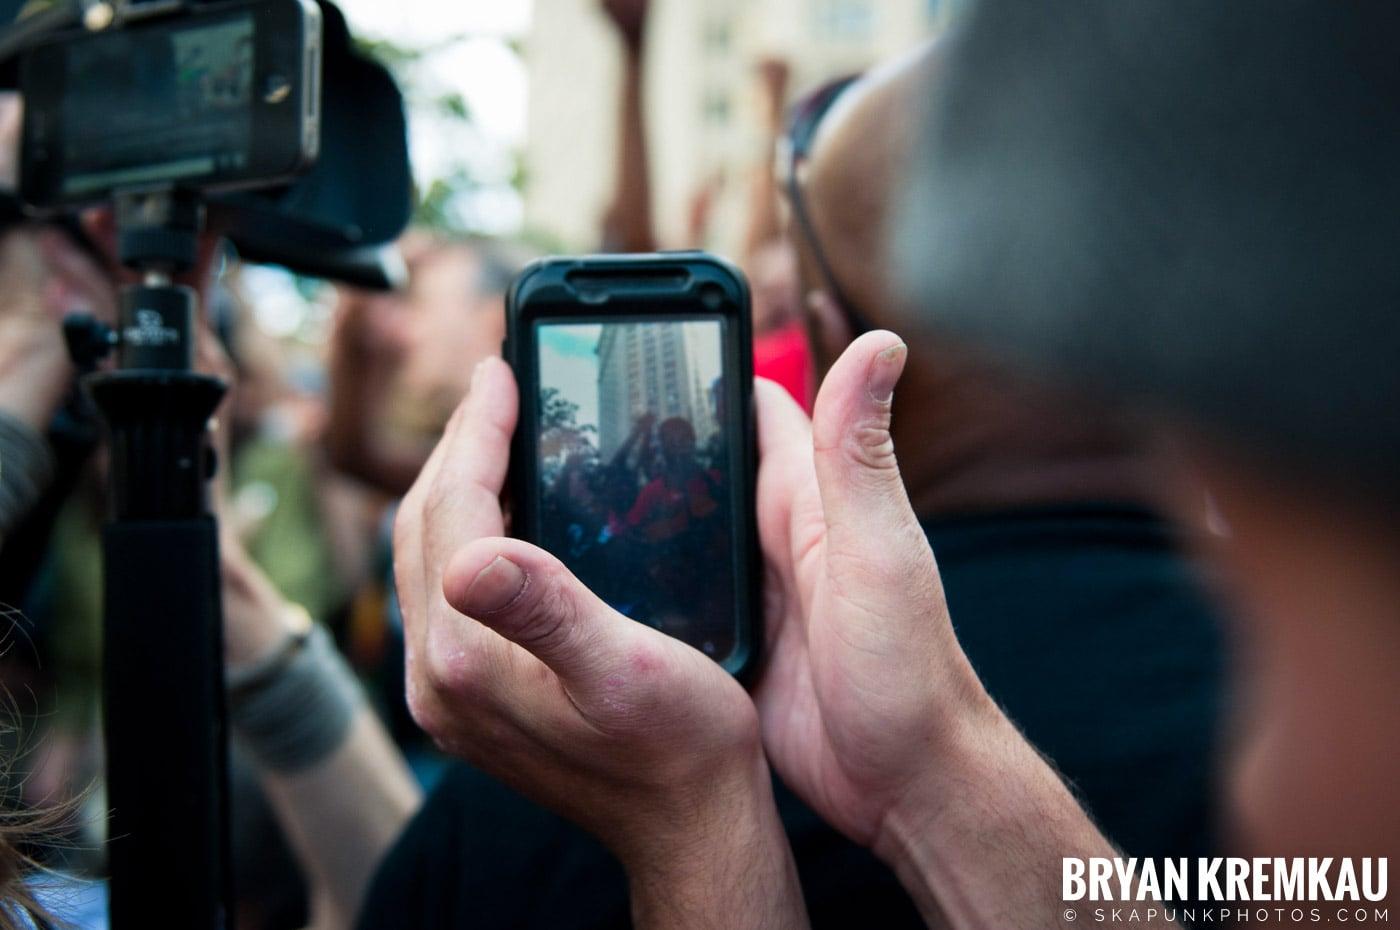 Tom Morello @ Occupy Wall Street Anniversary Concert, Foley Square, NYC - 9.16.12 (16)